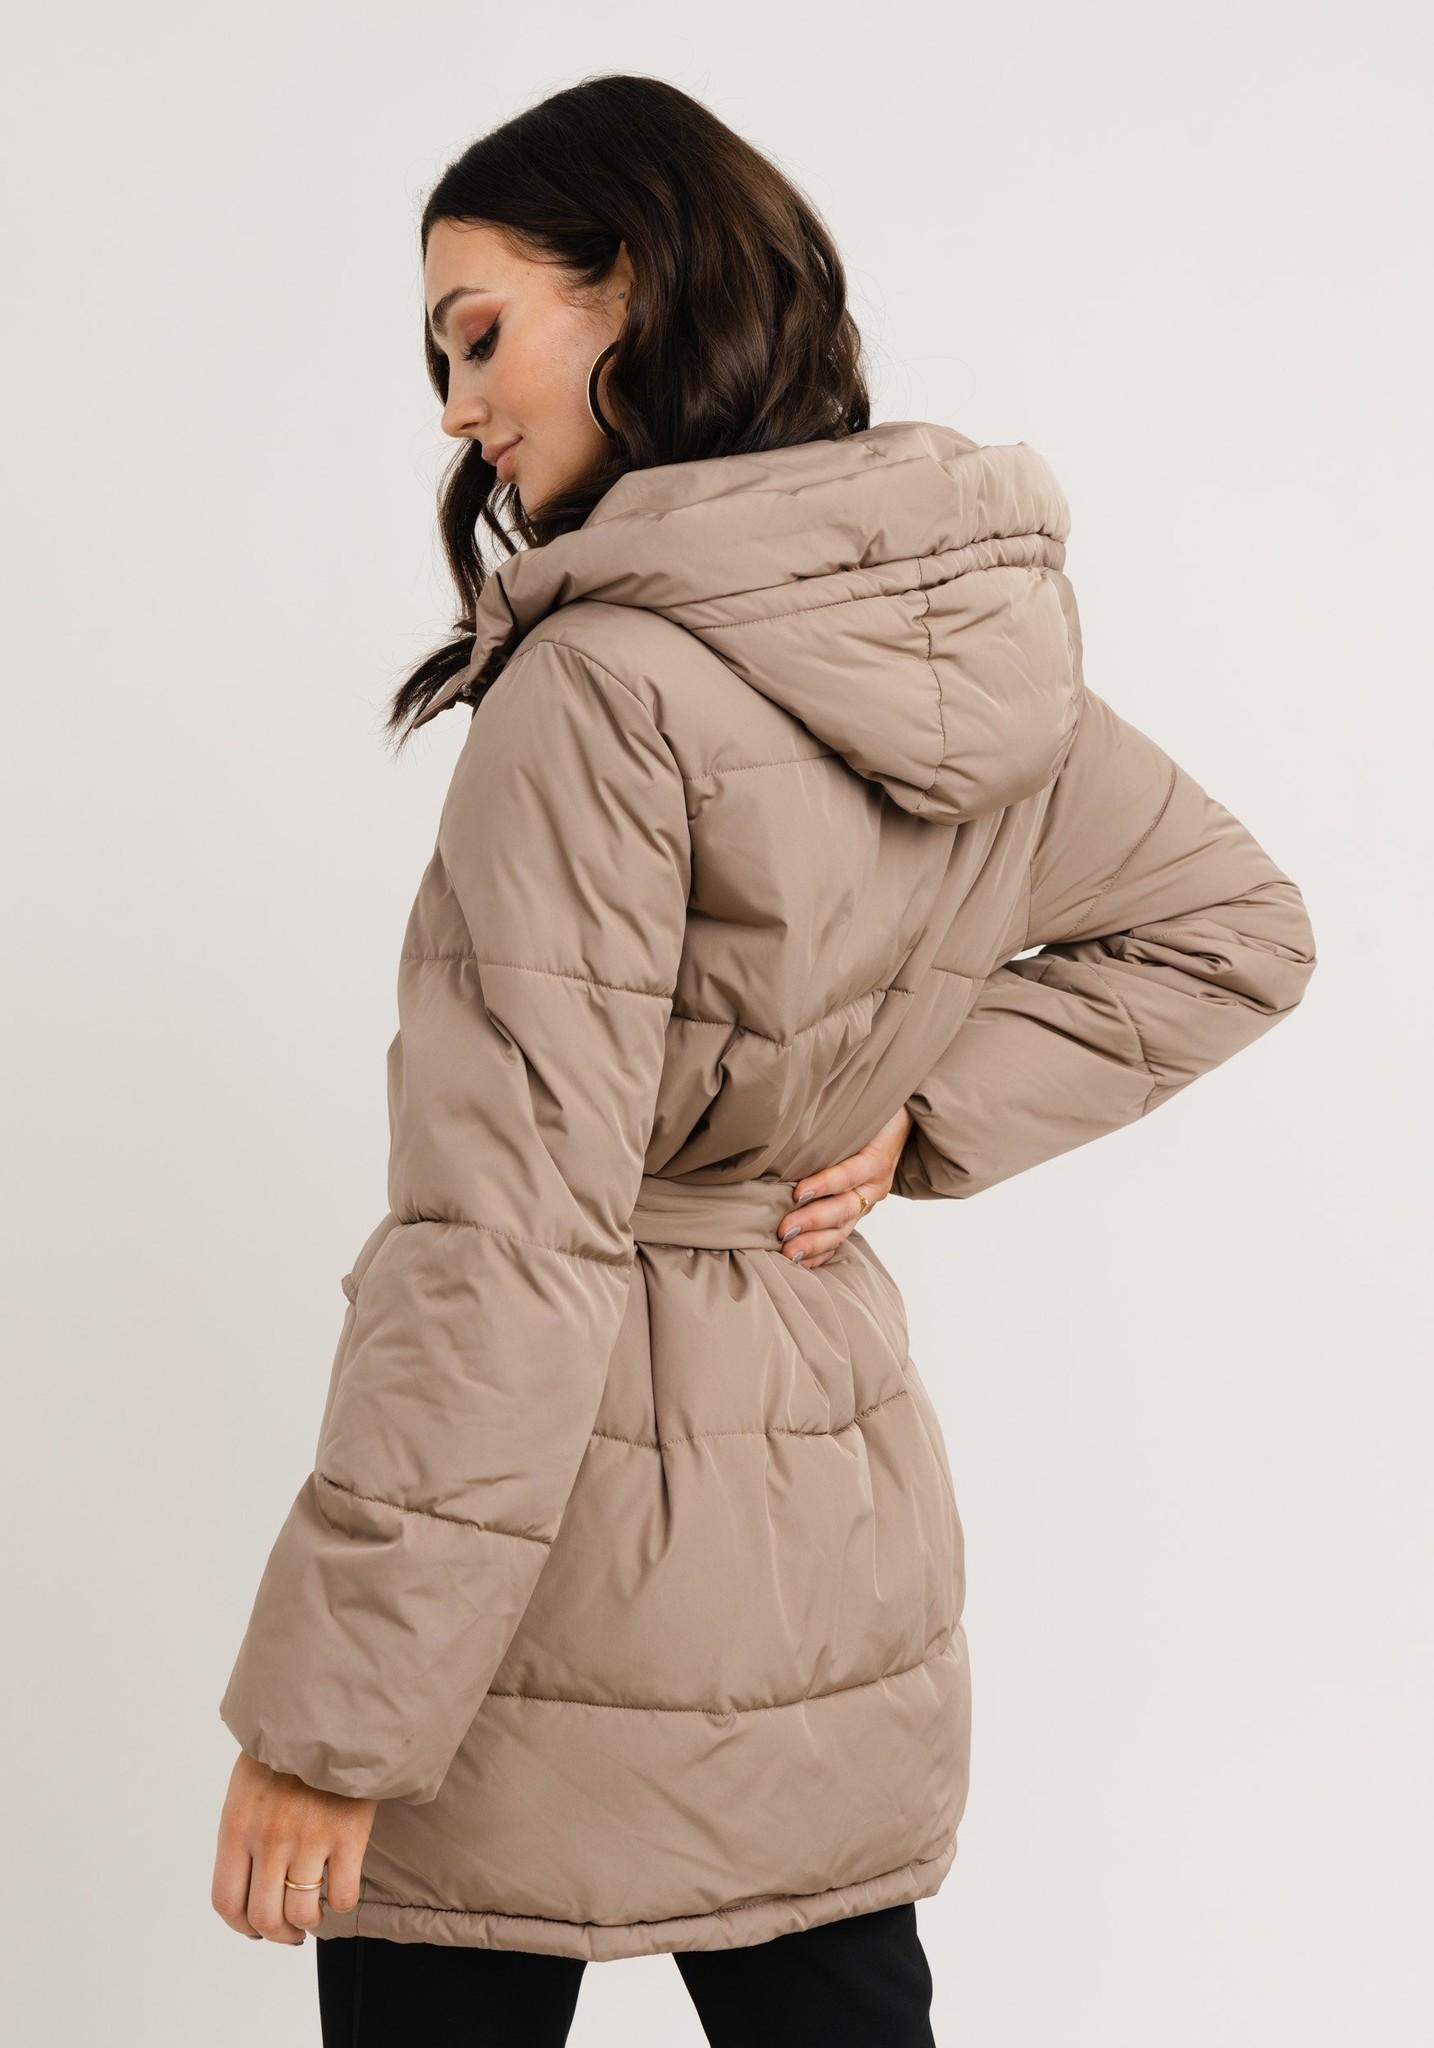 RC Fanny Puff Jacket